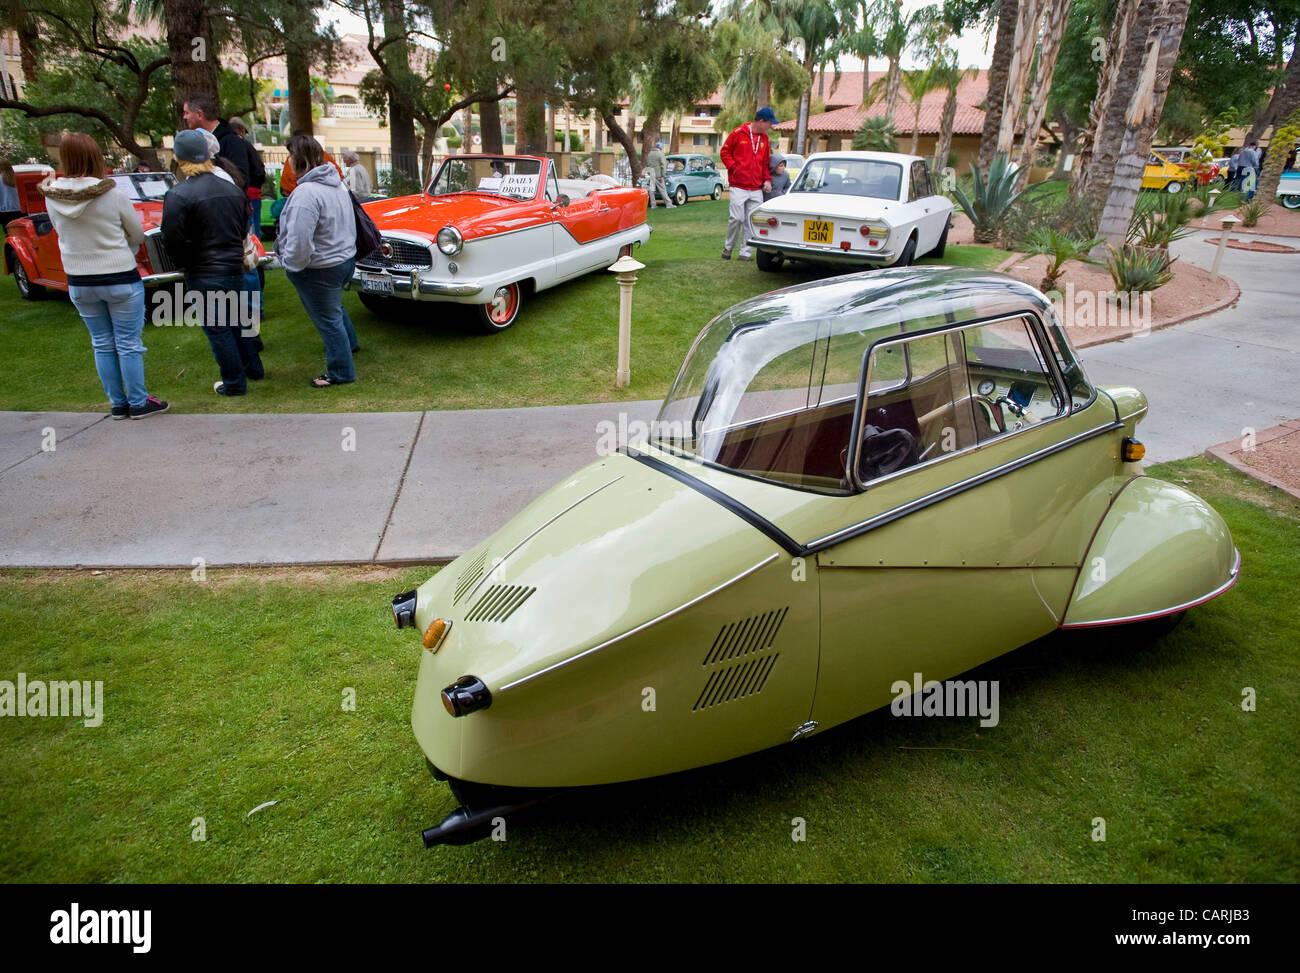 April 14, 2012 - Phoeniz, Arizona, U.S. -  A 1954 Messerschmitt KR 175 Kabineroller is one of some 60 micro and Stock Photo